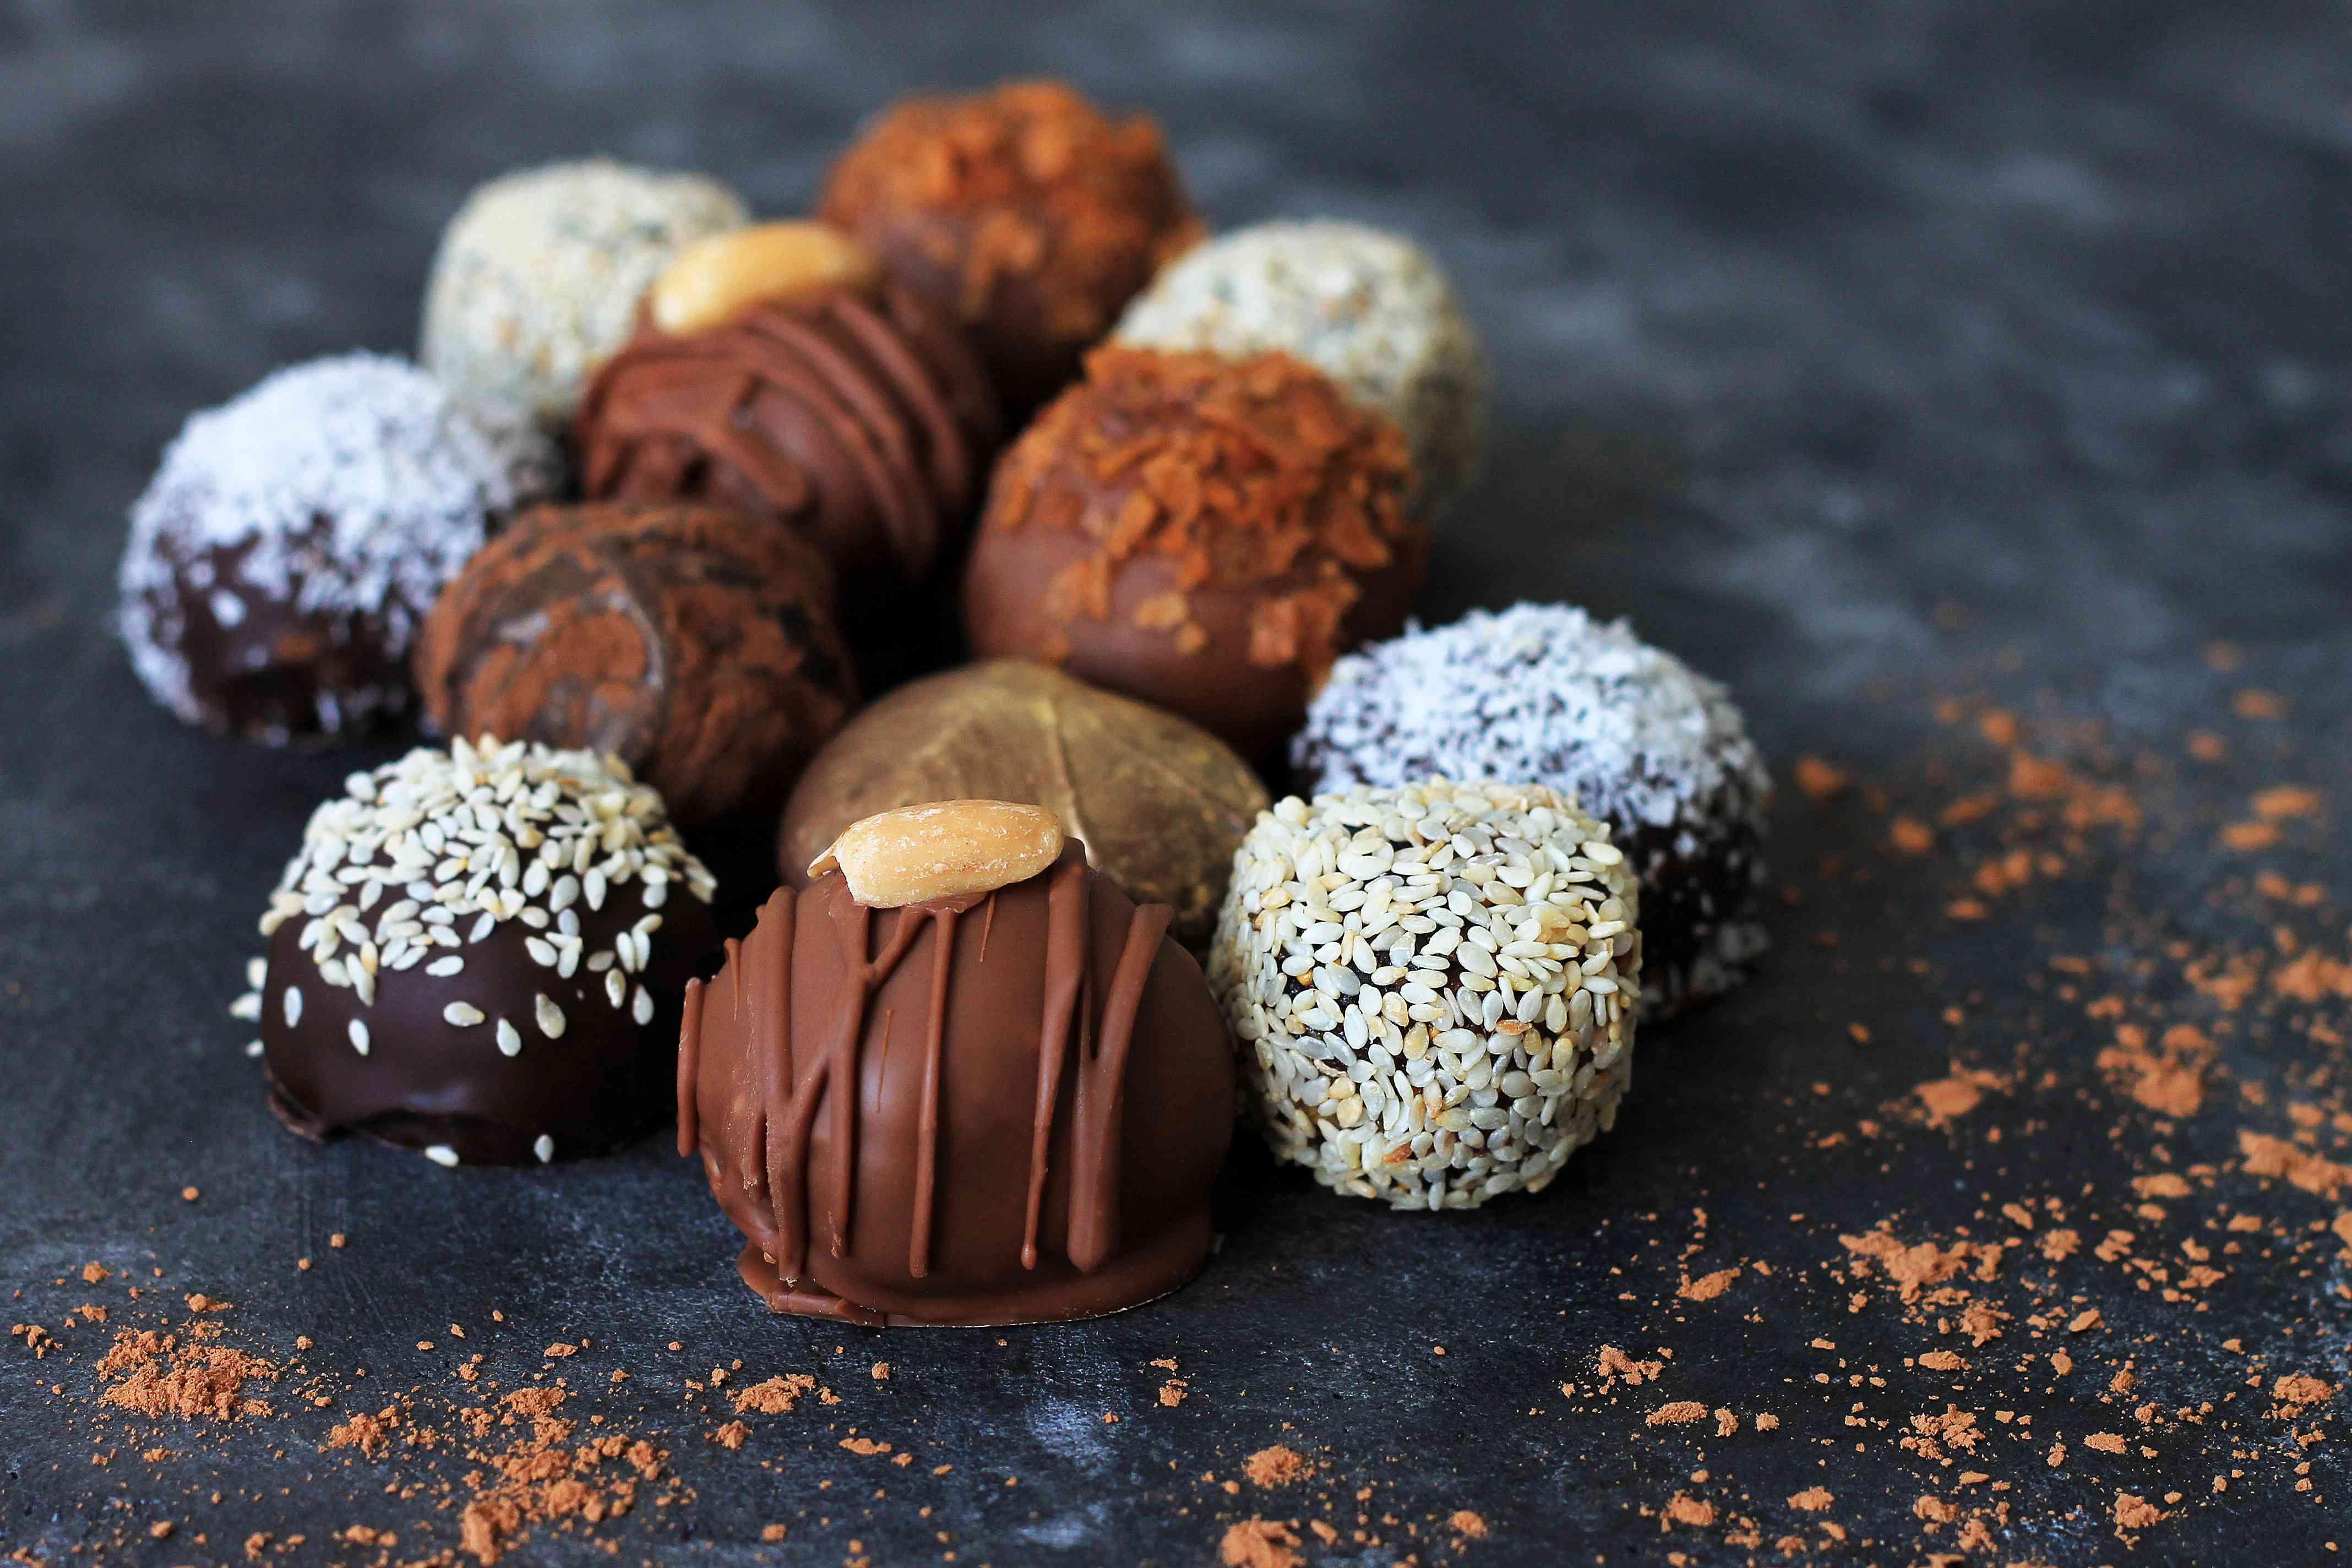 Homemade chocolate candies for Valentine's Day on dark background.